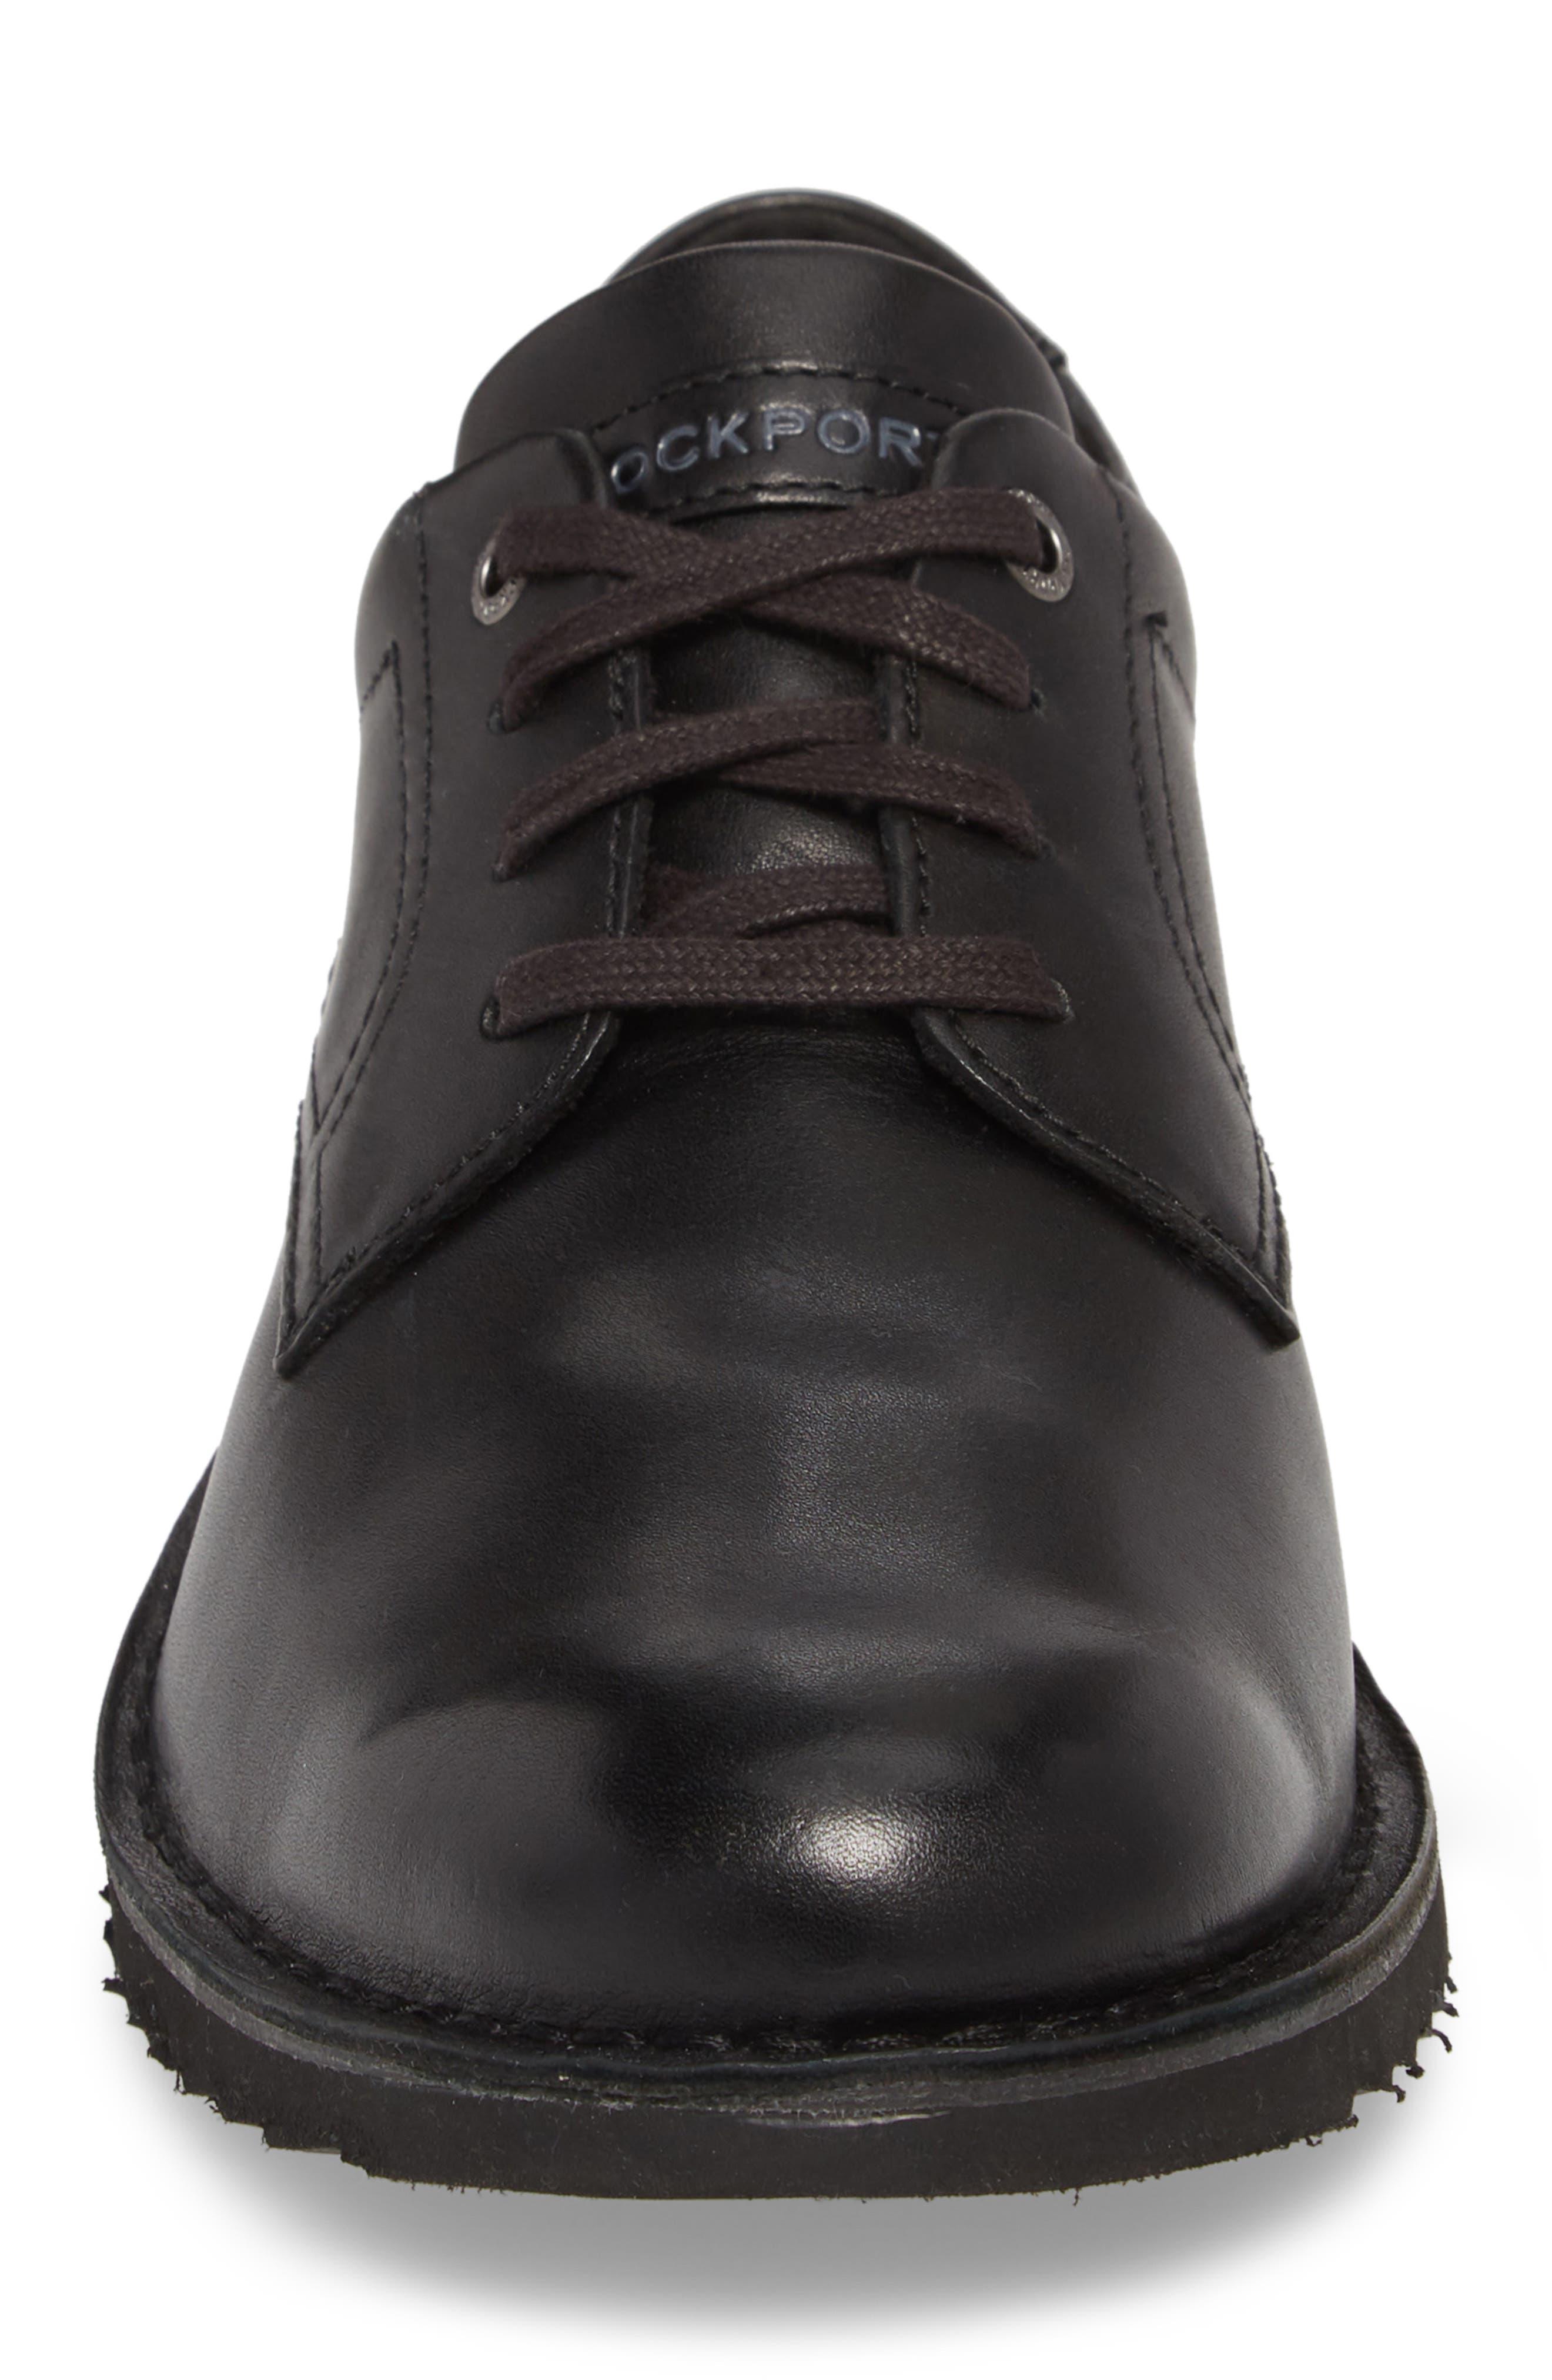 Cabot Plain Toe Derby,                             Alternate thumbnail 4, color,                             Black Leather